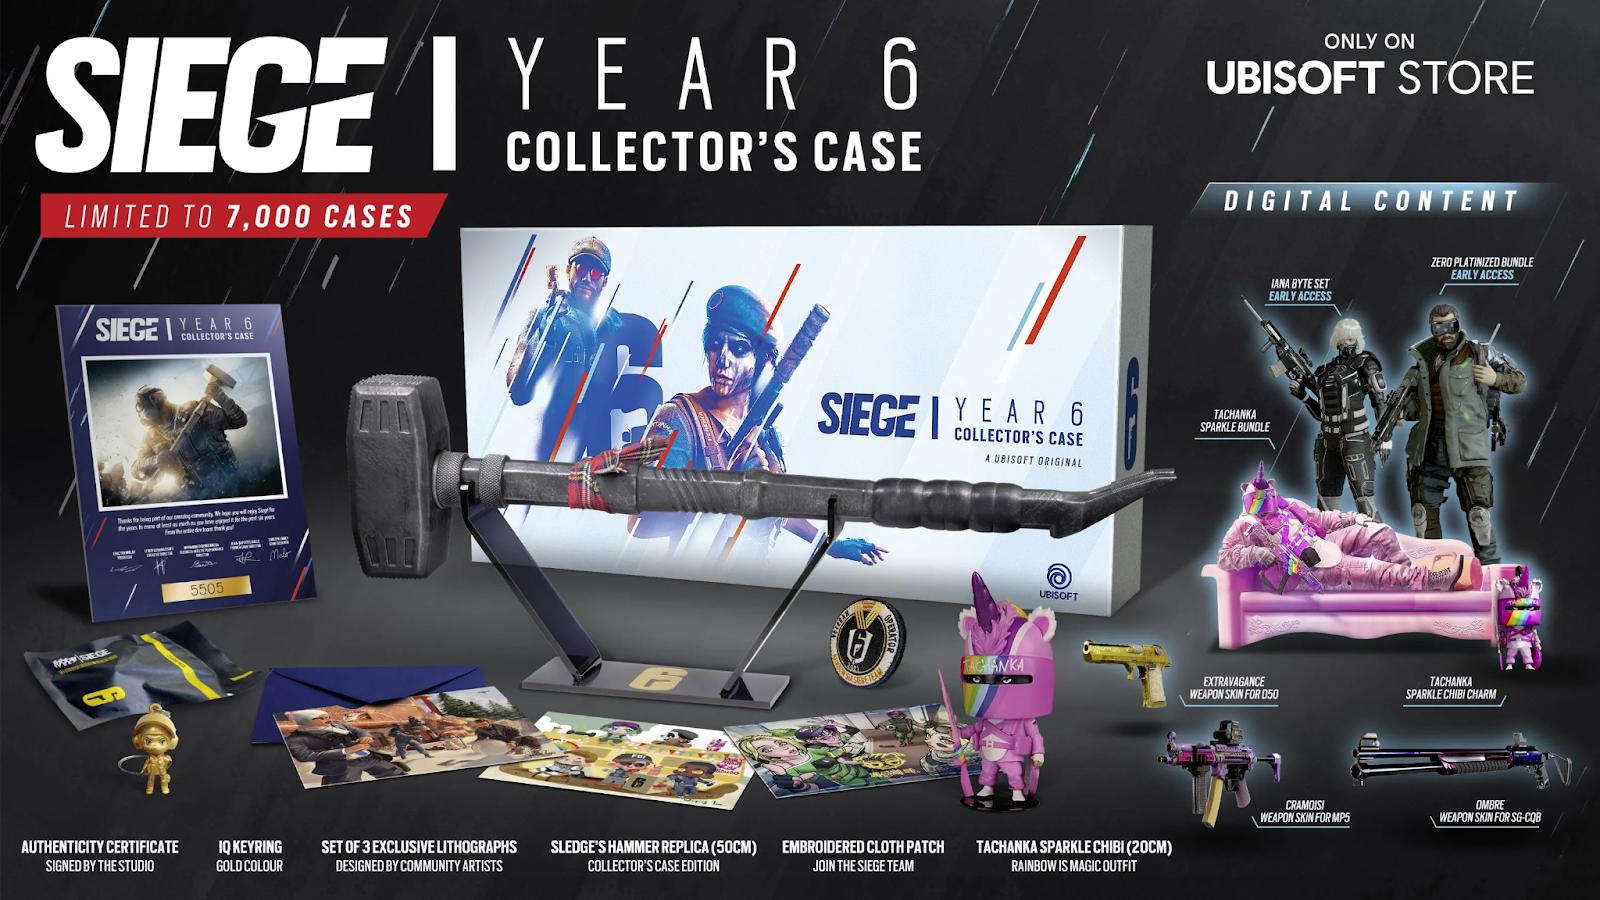 Siege Year 6 Collector's Case